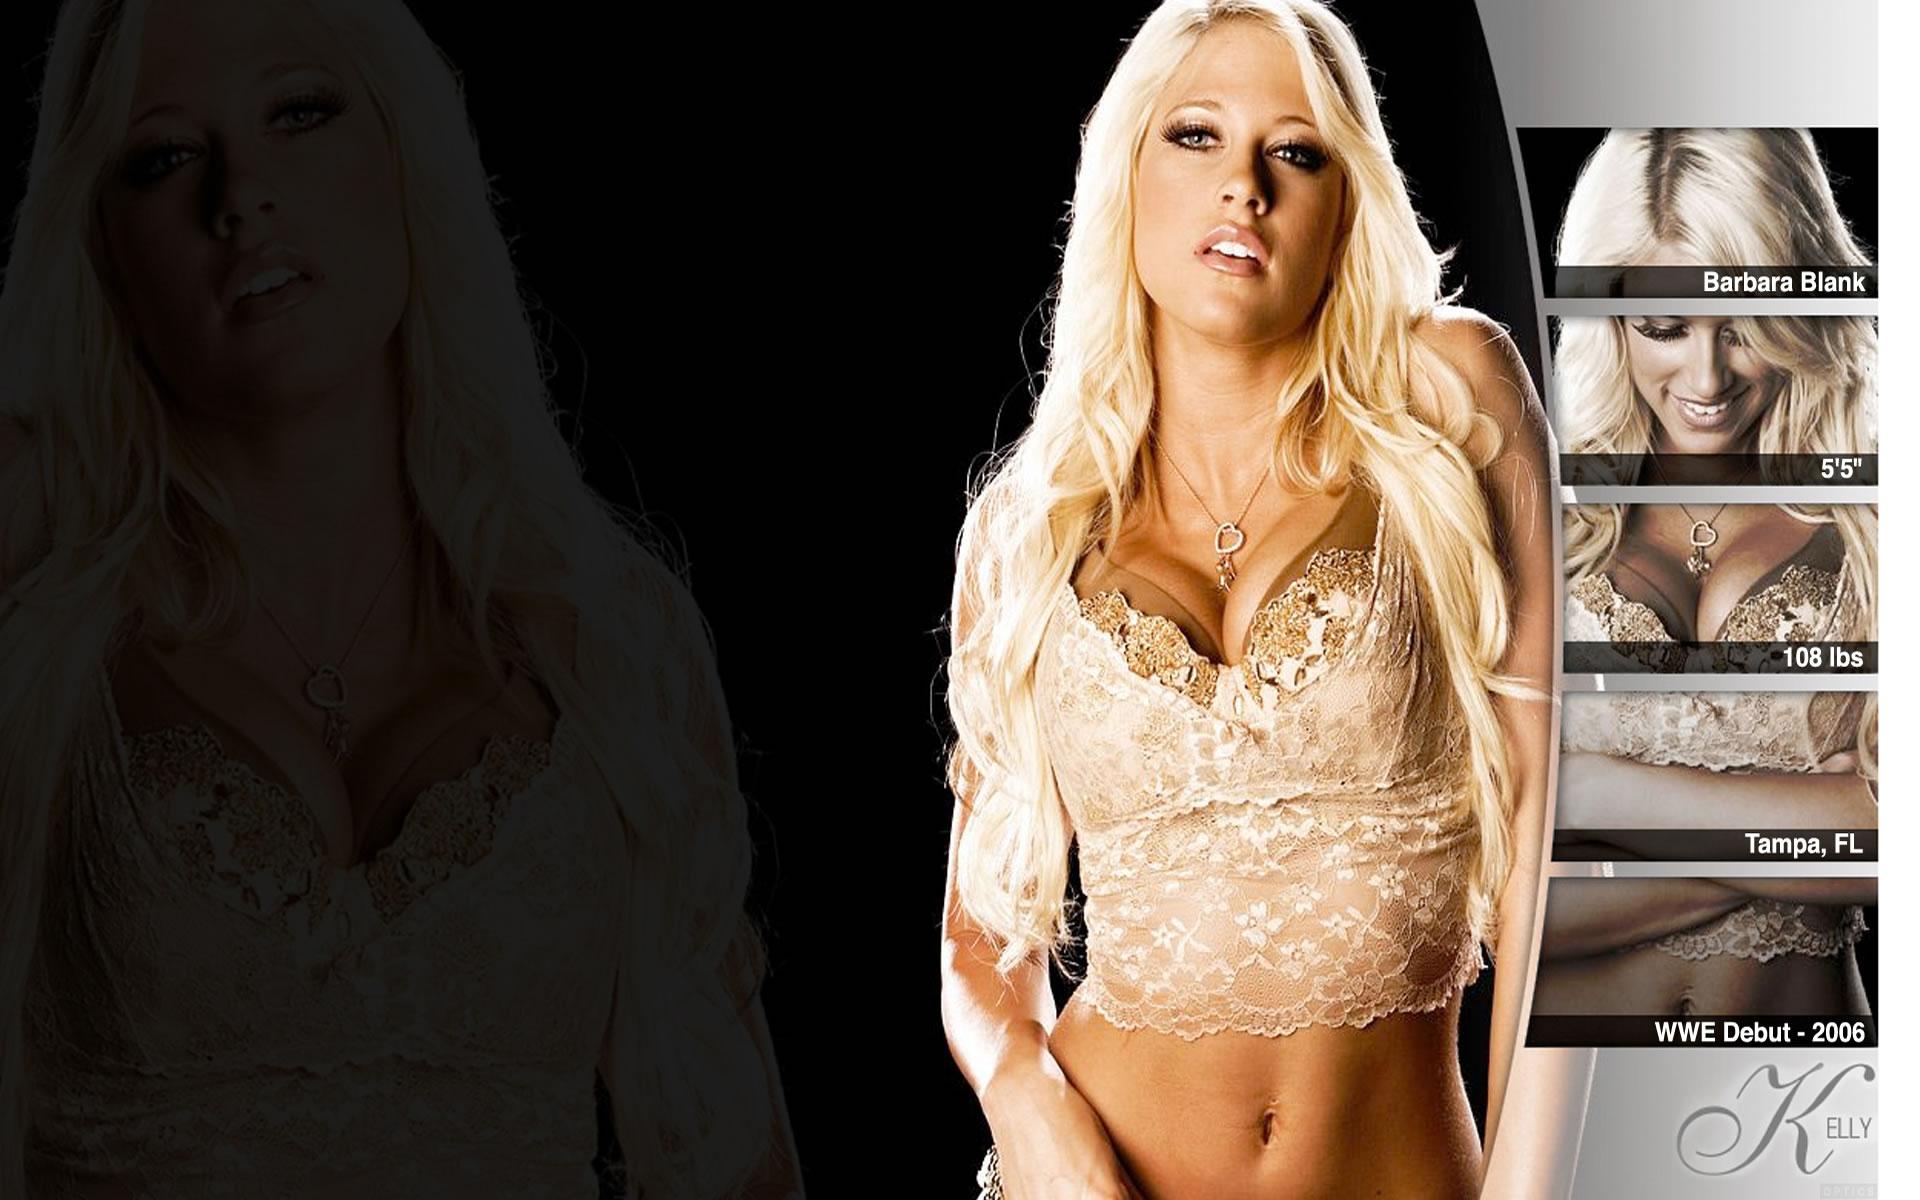 Wallpaper Chica WWE